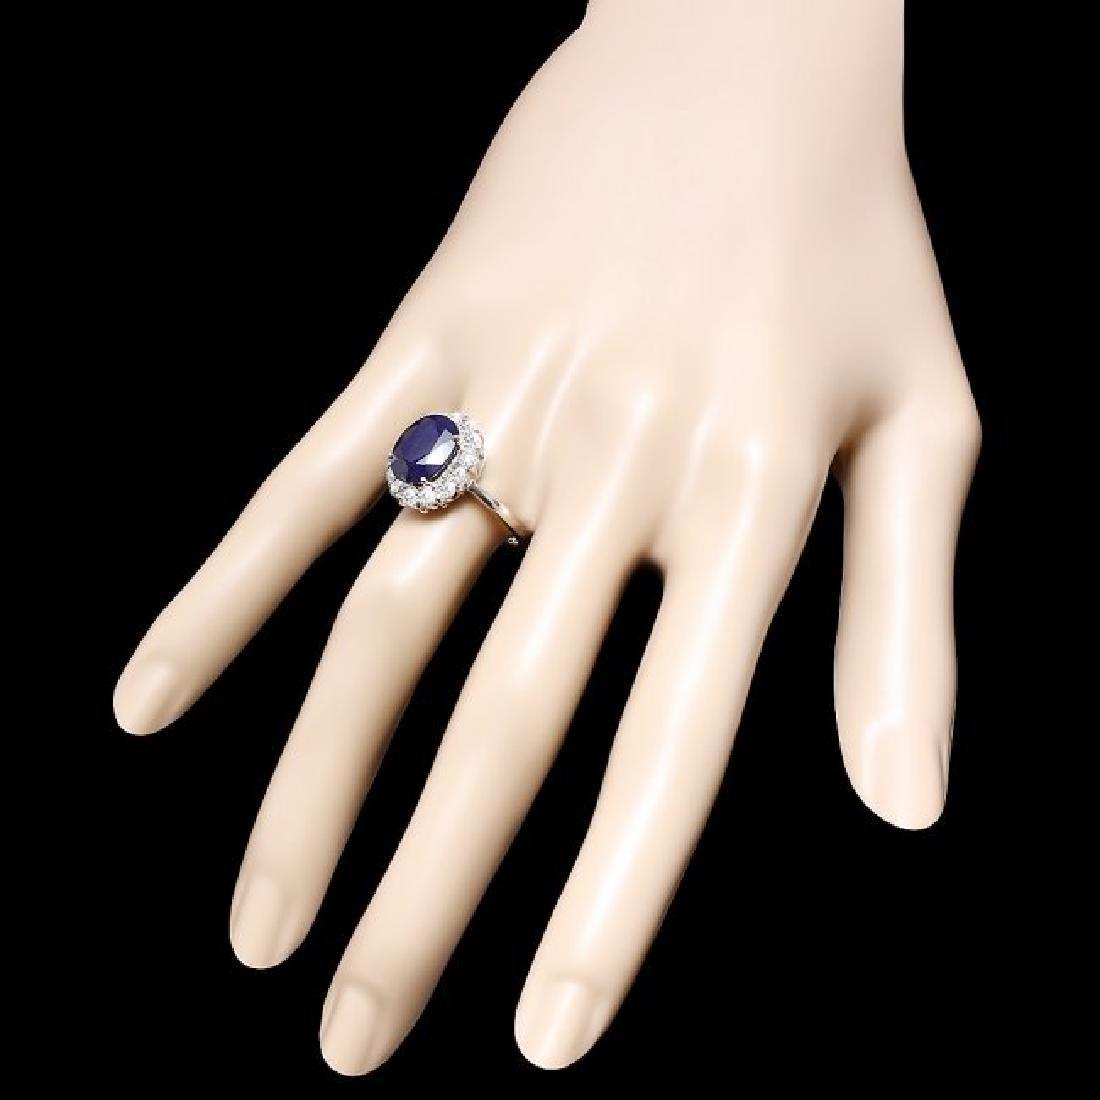 14k Gold 5.00ct Sapphire 1.00ct Diamond Ring - 3